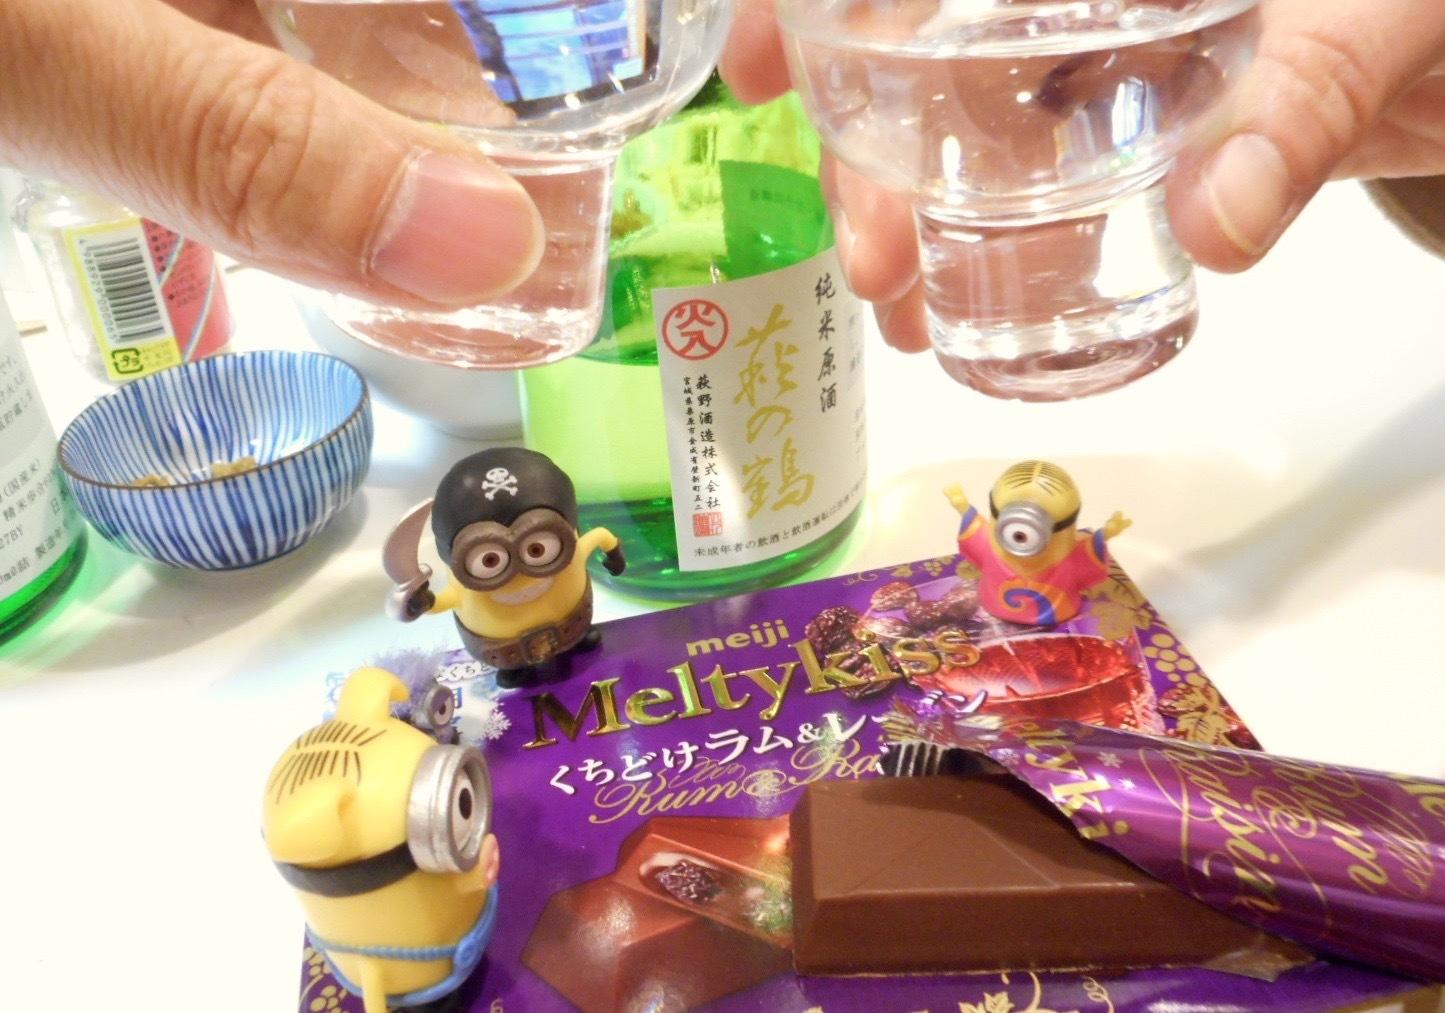 haginotsuru_kikizake_set27by12.jpg